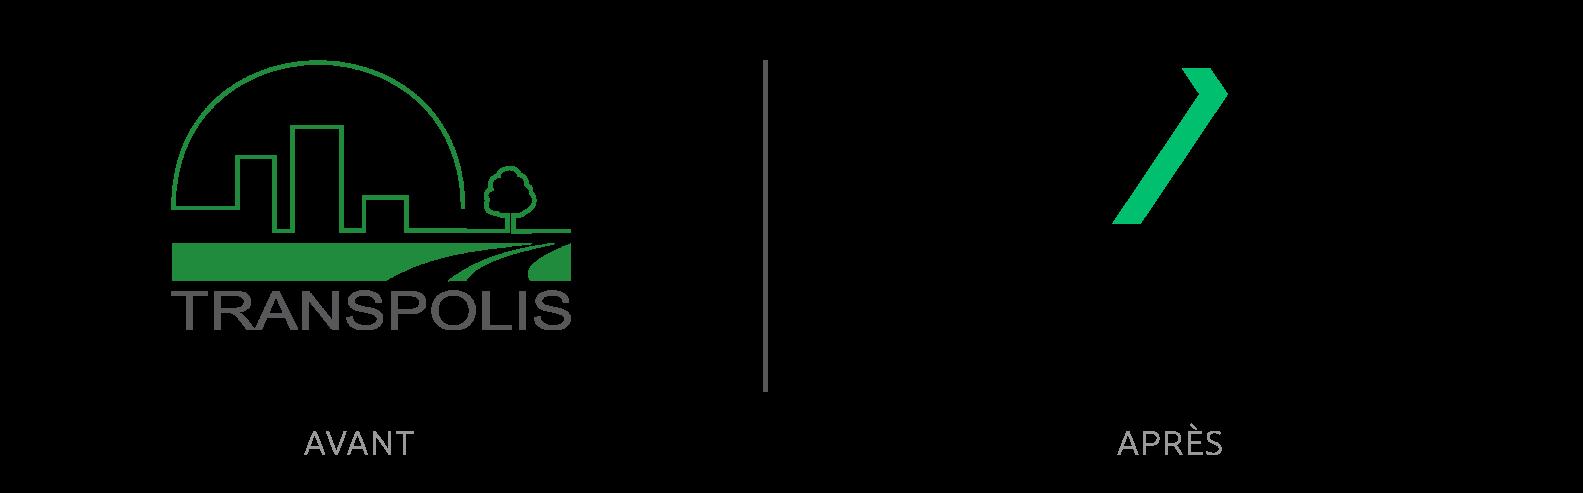 transpolis_logo_avant_apres